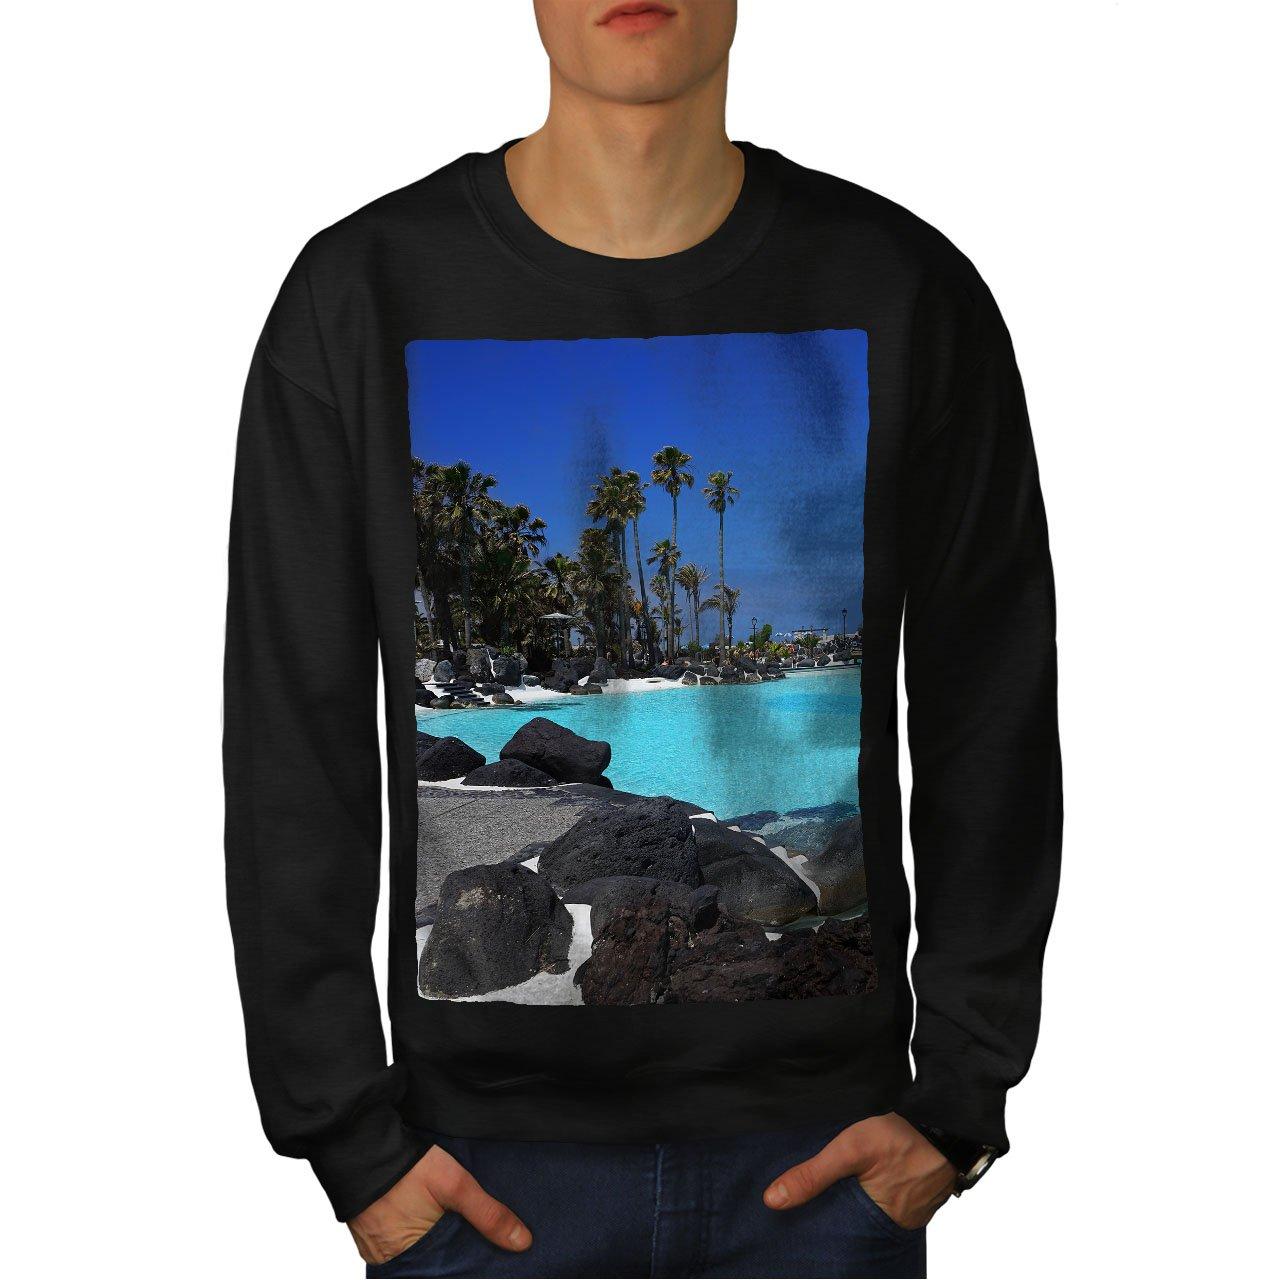 Nature Casual Jumper wellcoda Sea Tropical Sky Mens Sweatshirt